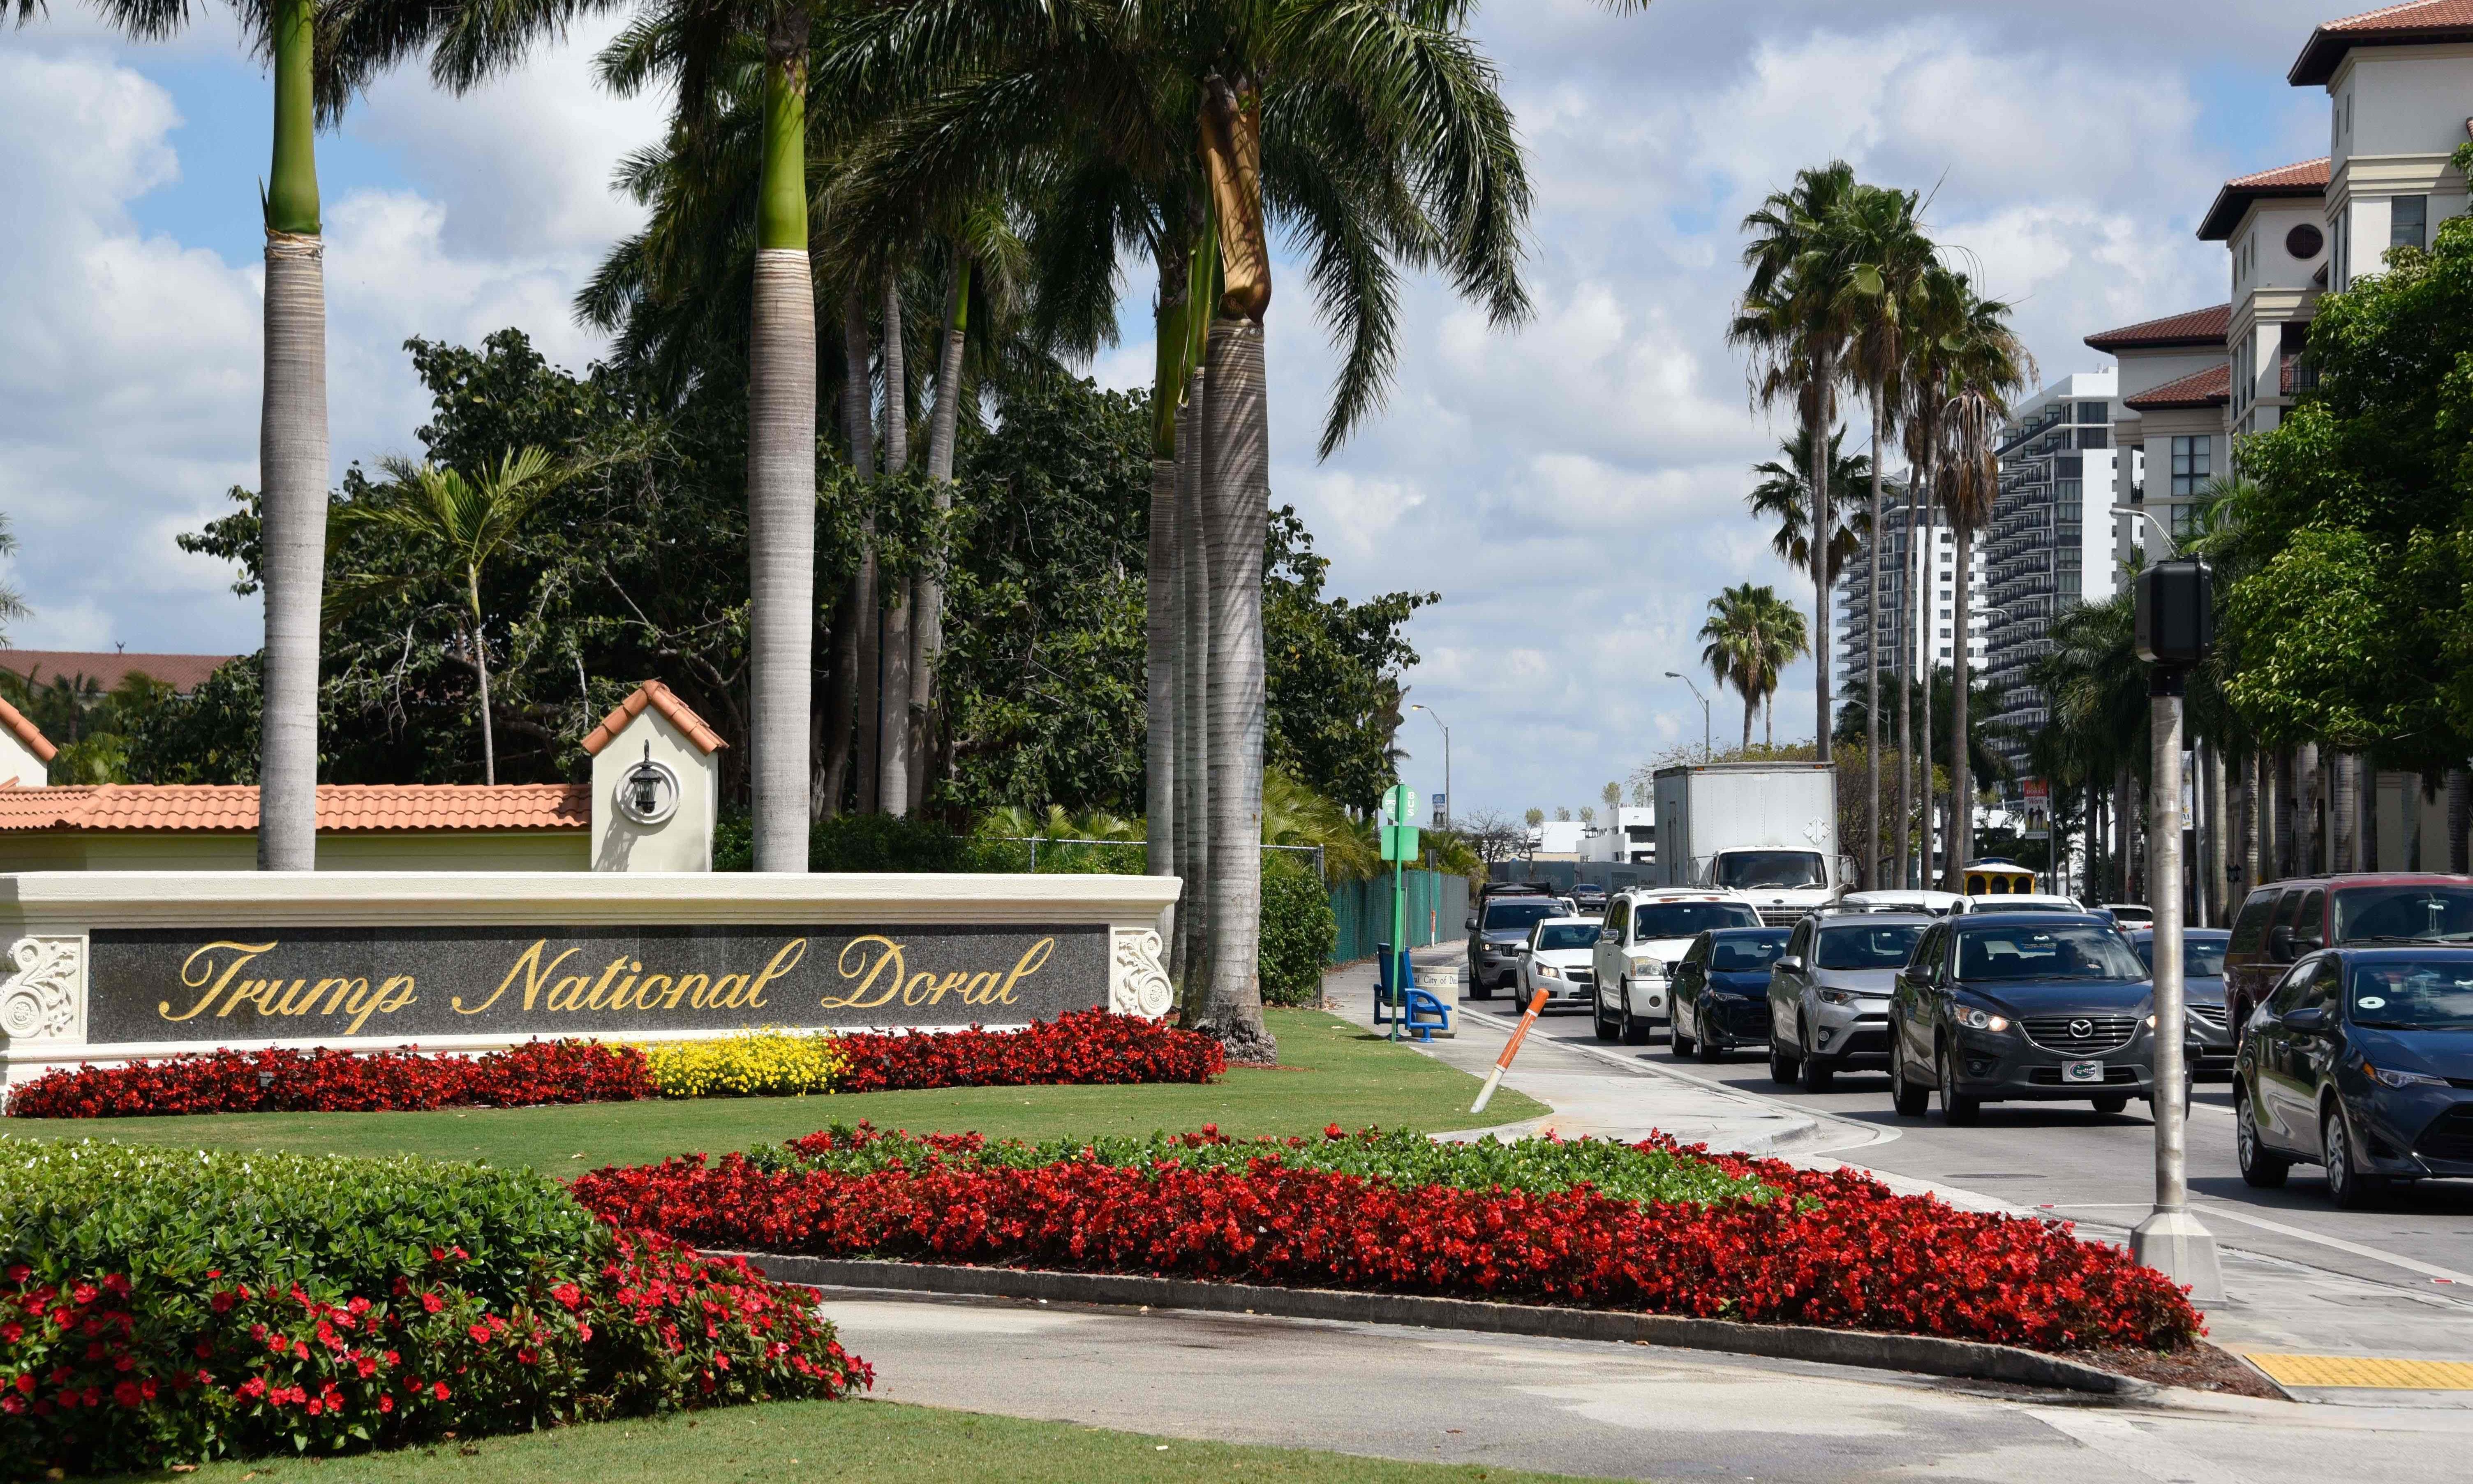 Donald Trump scraps plan to host G7 at his Doral resort, blaming 'irrational hostility'